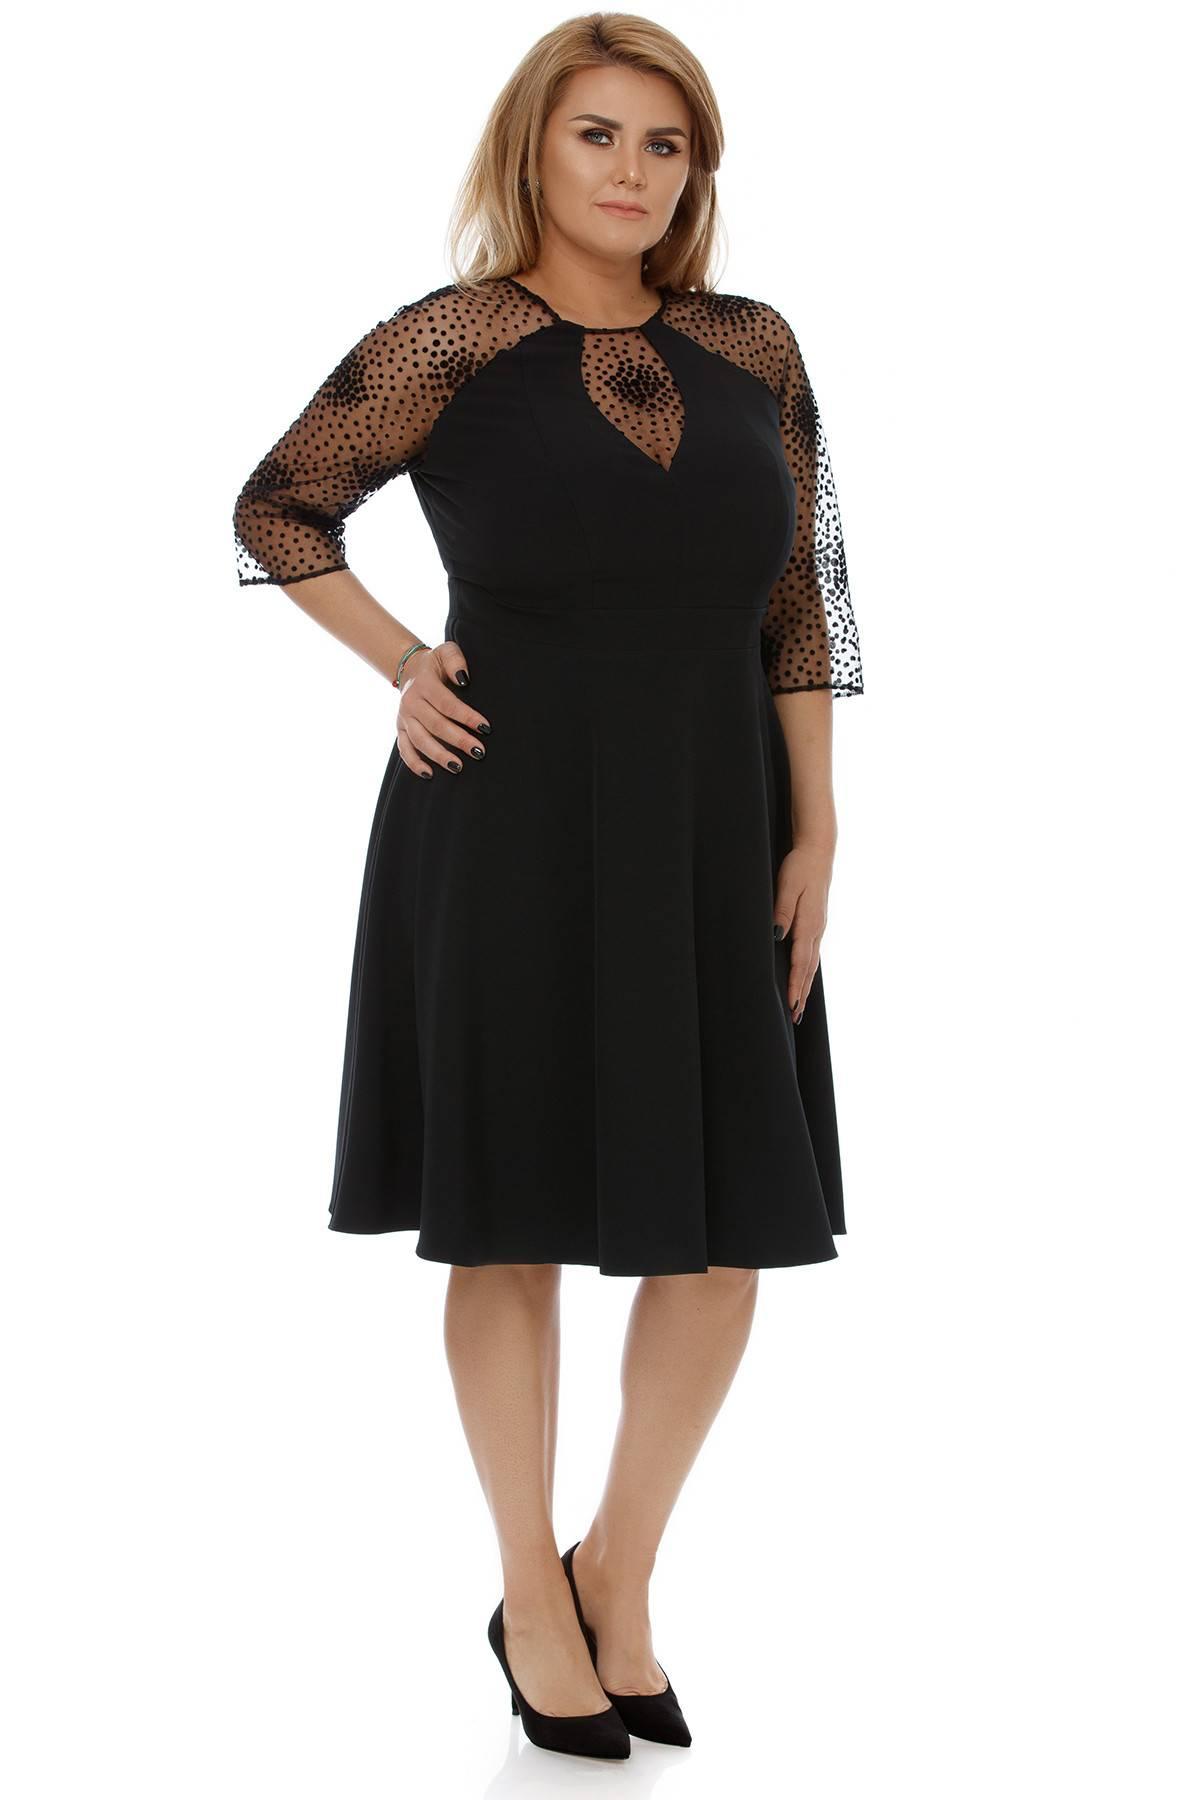 Rochie Plus Size Danielle Neagră